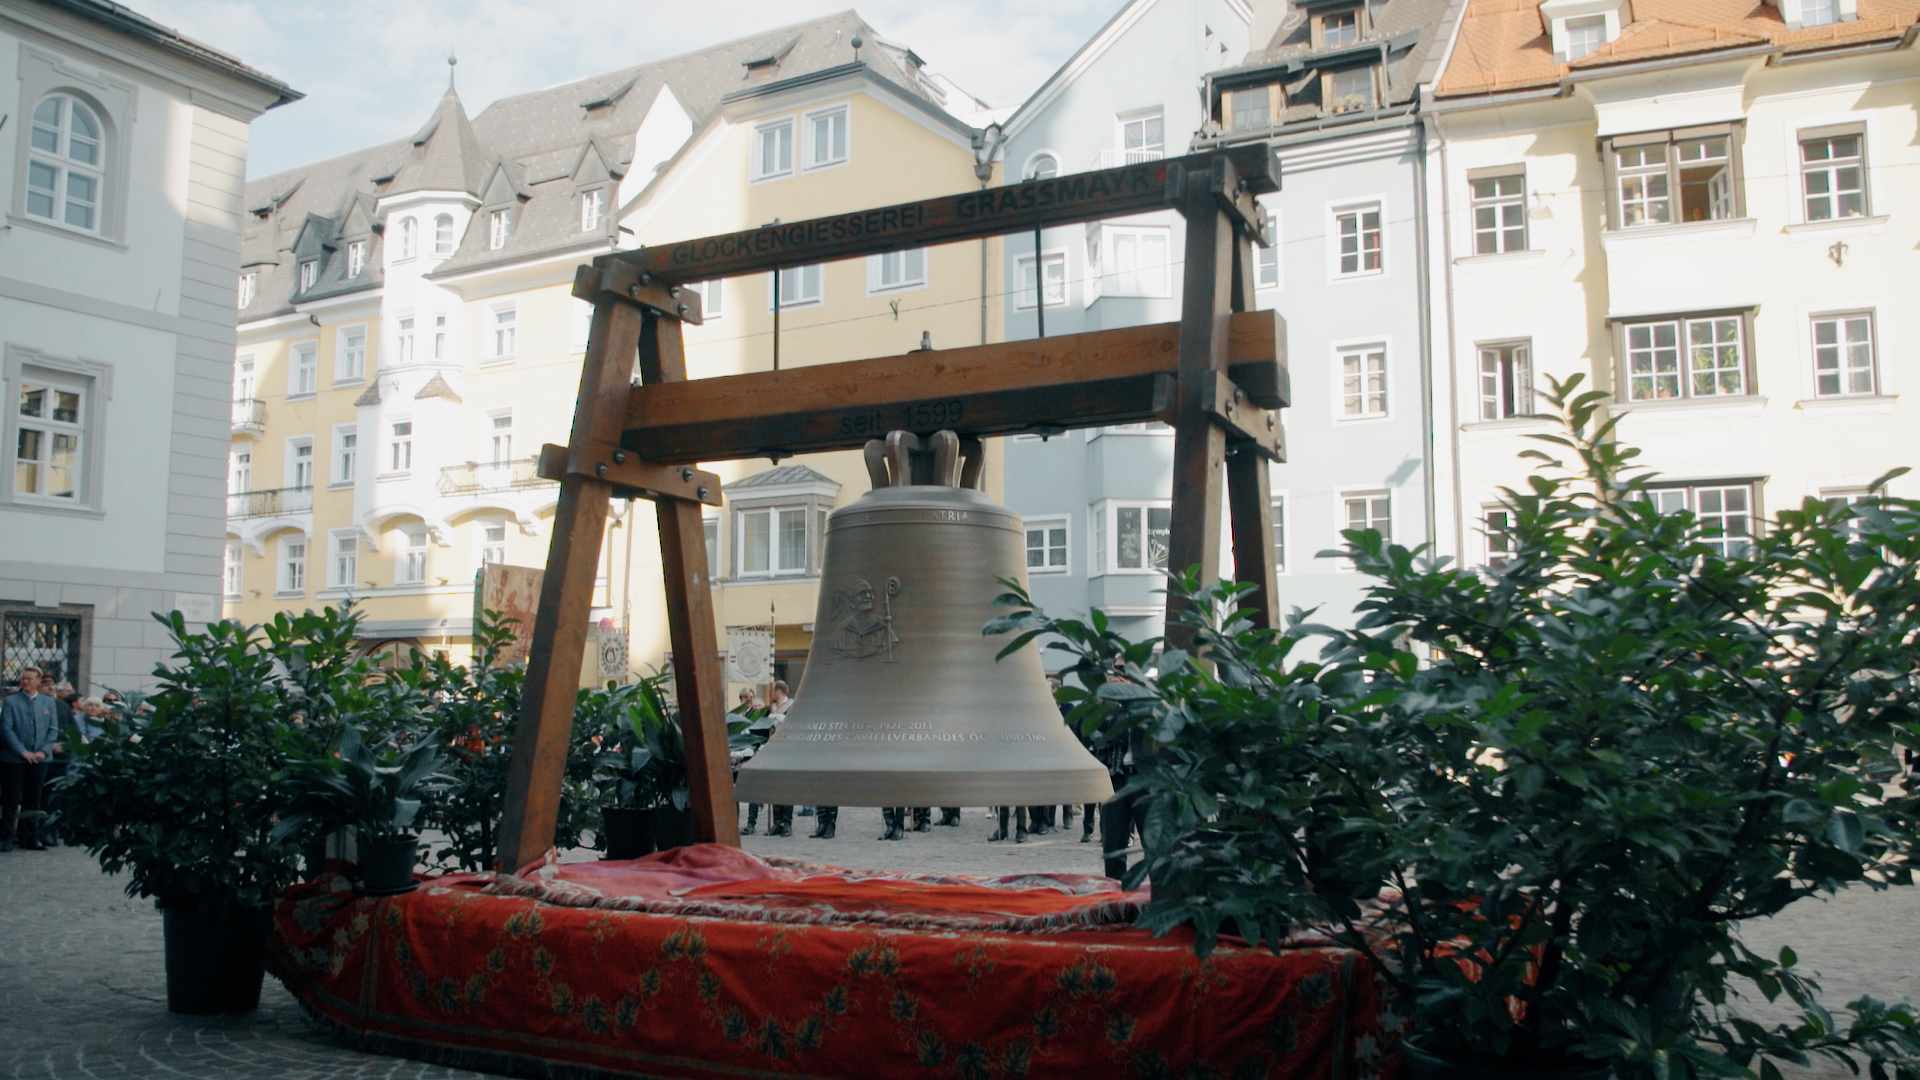 Innsbrucks neue Glocke